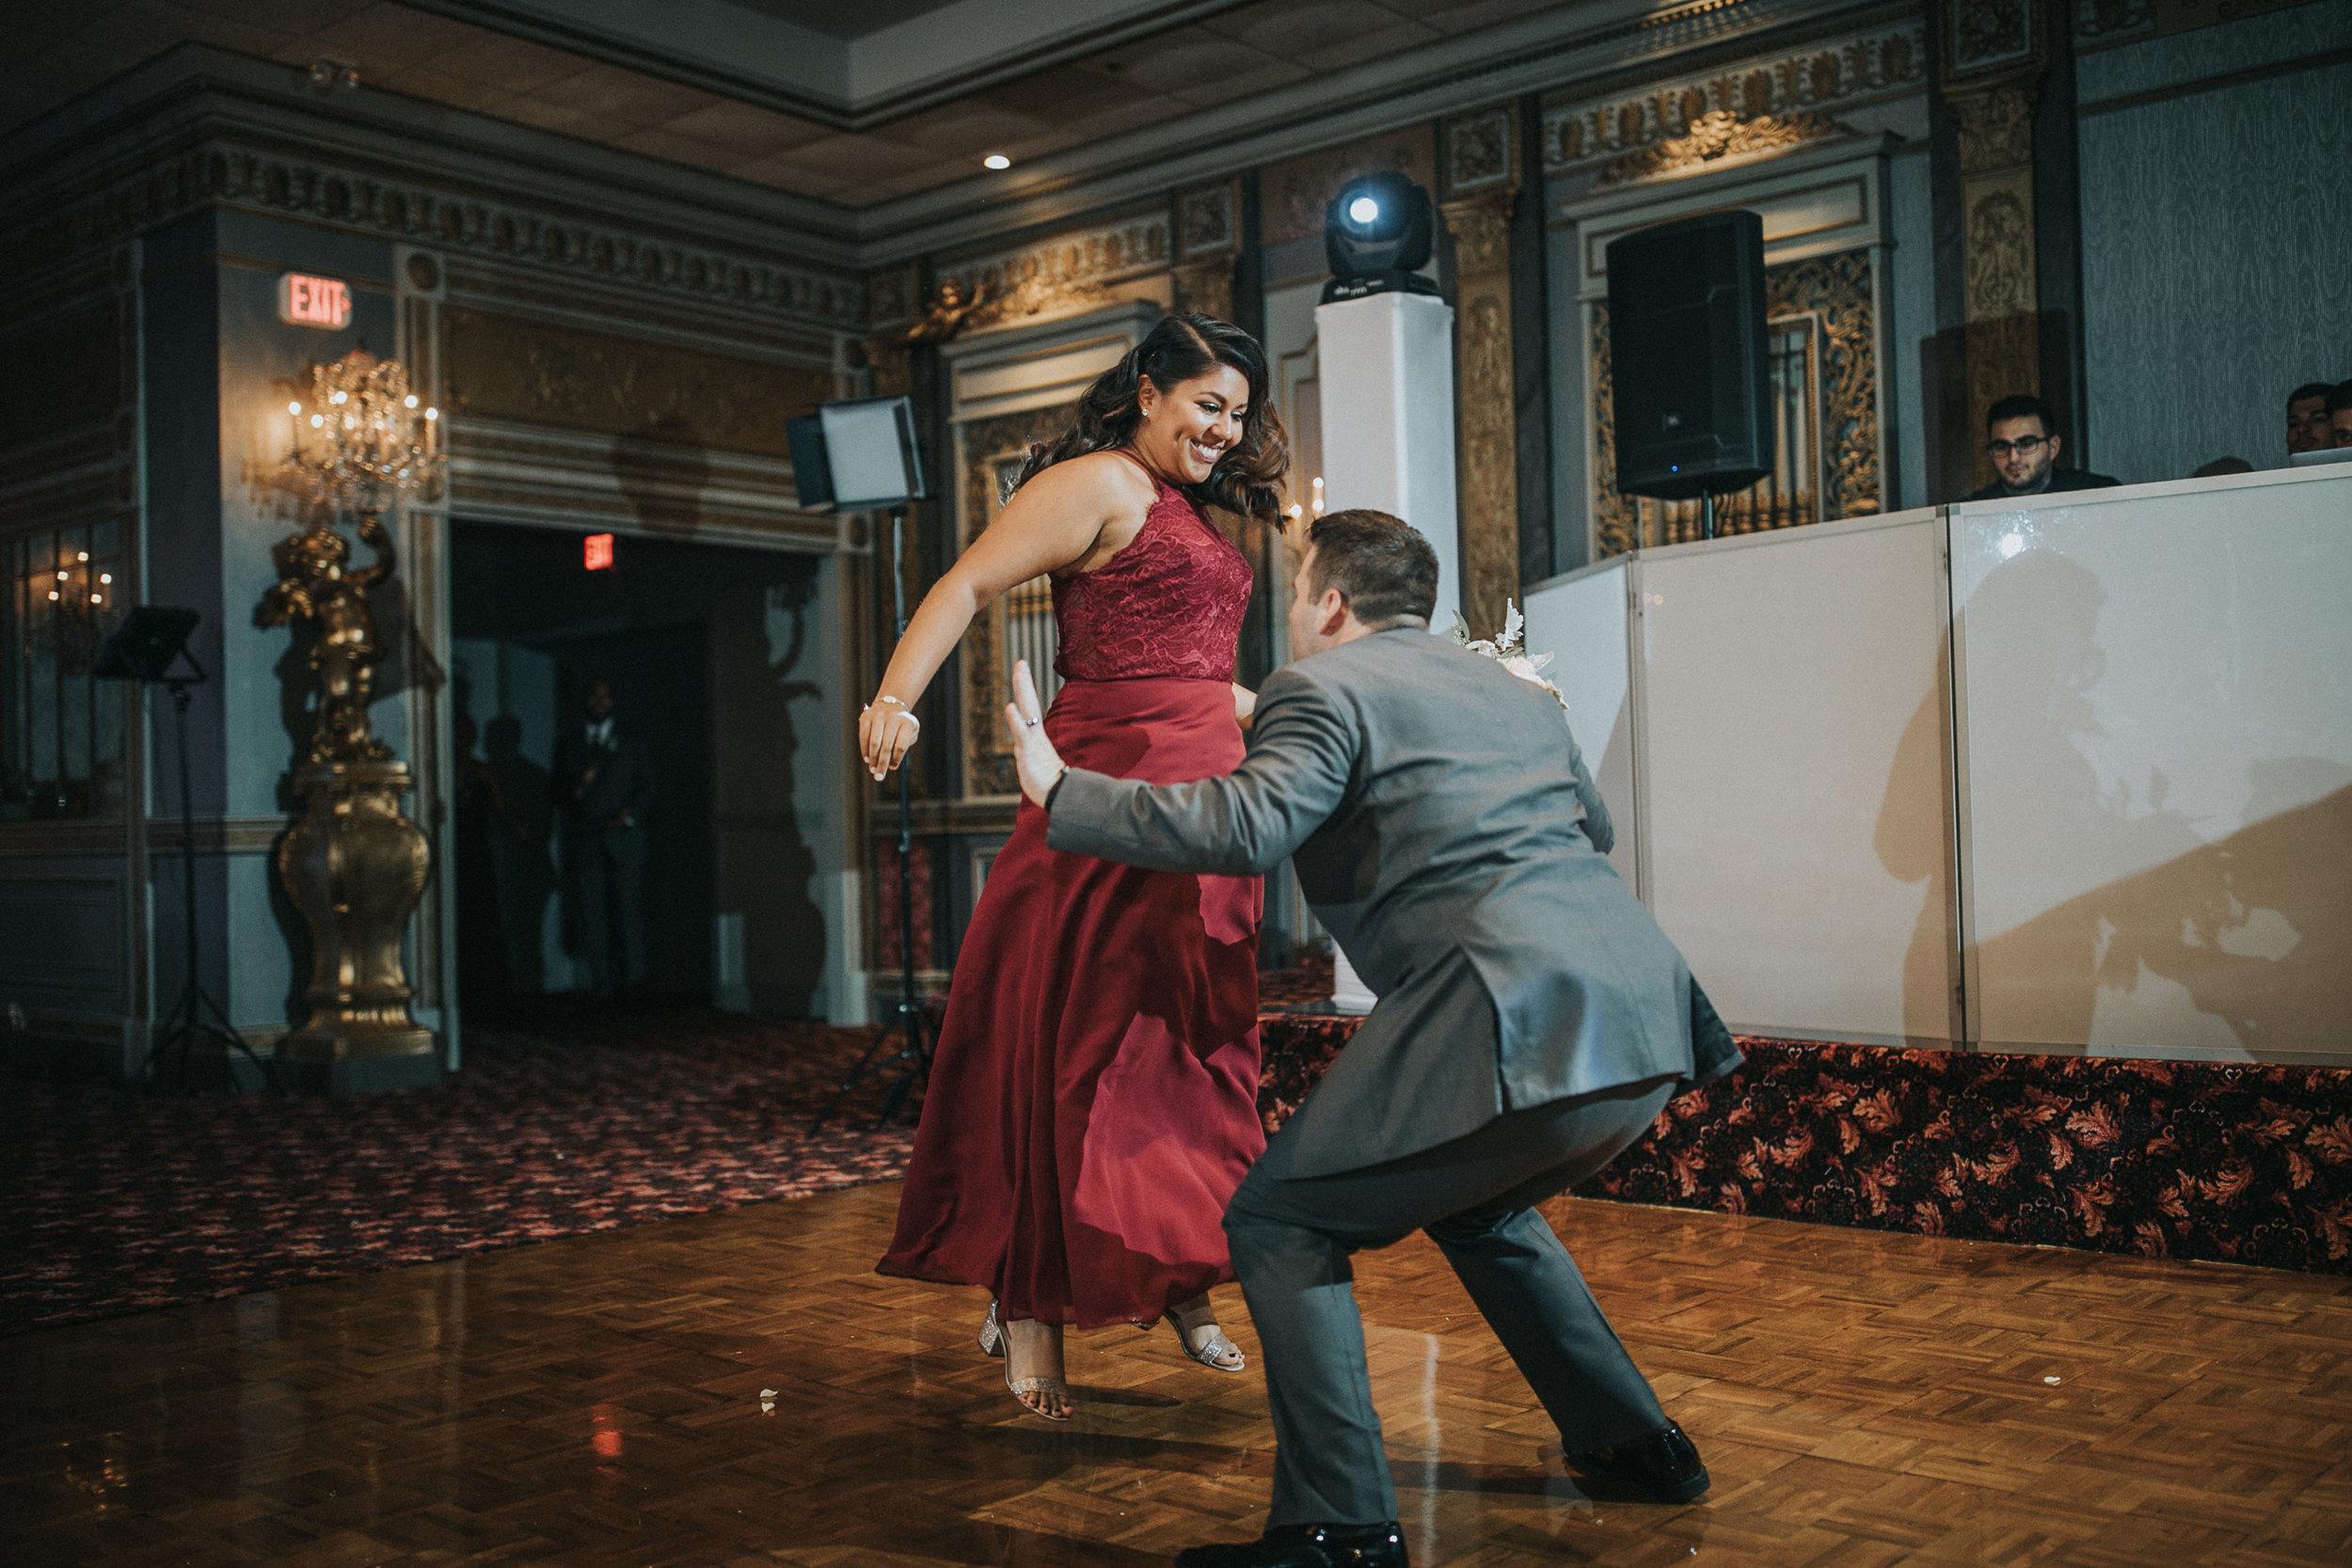 New-Jersey-Wedding-Photography-Fishers-Tudor-House-JennaLynnPhotography-Reception-Kathleen&Eddie-72.jpg